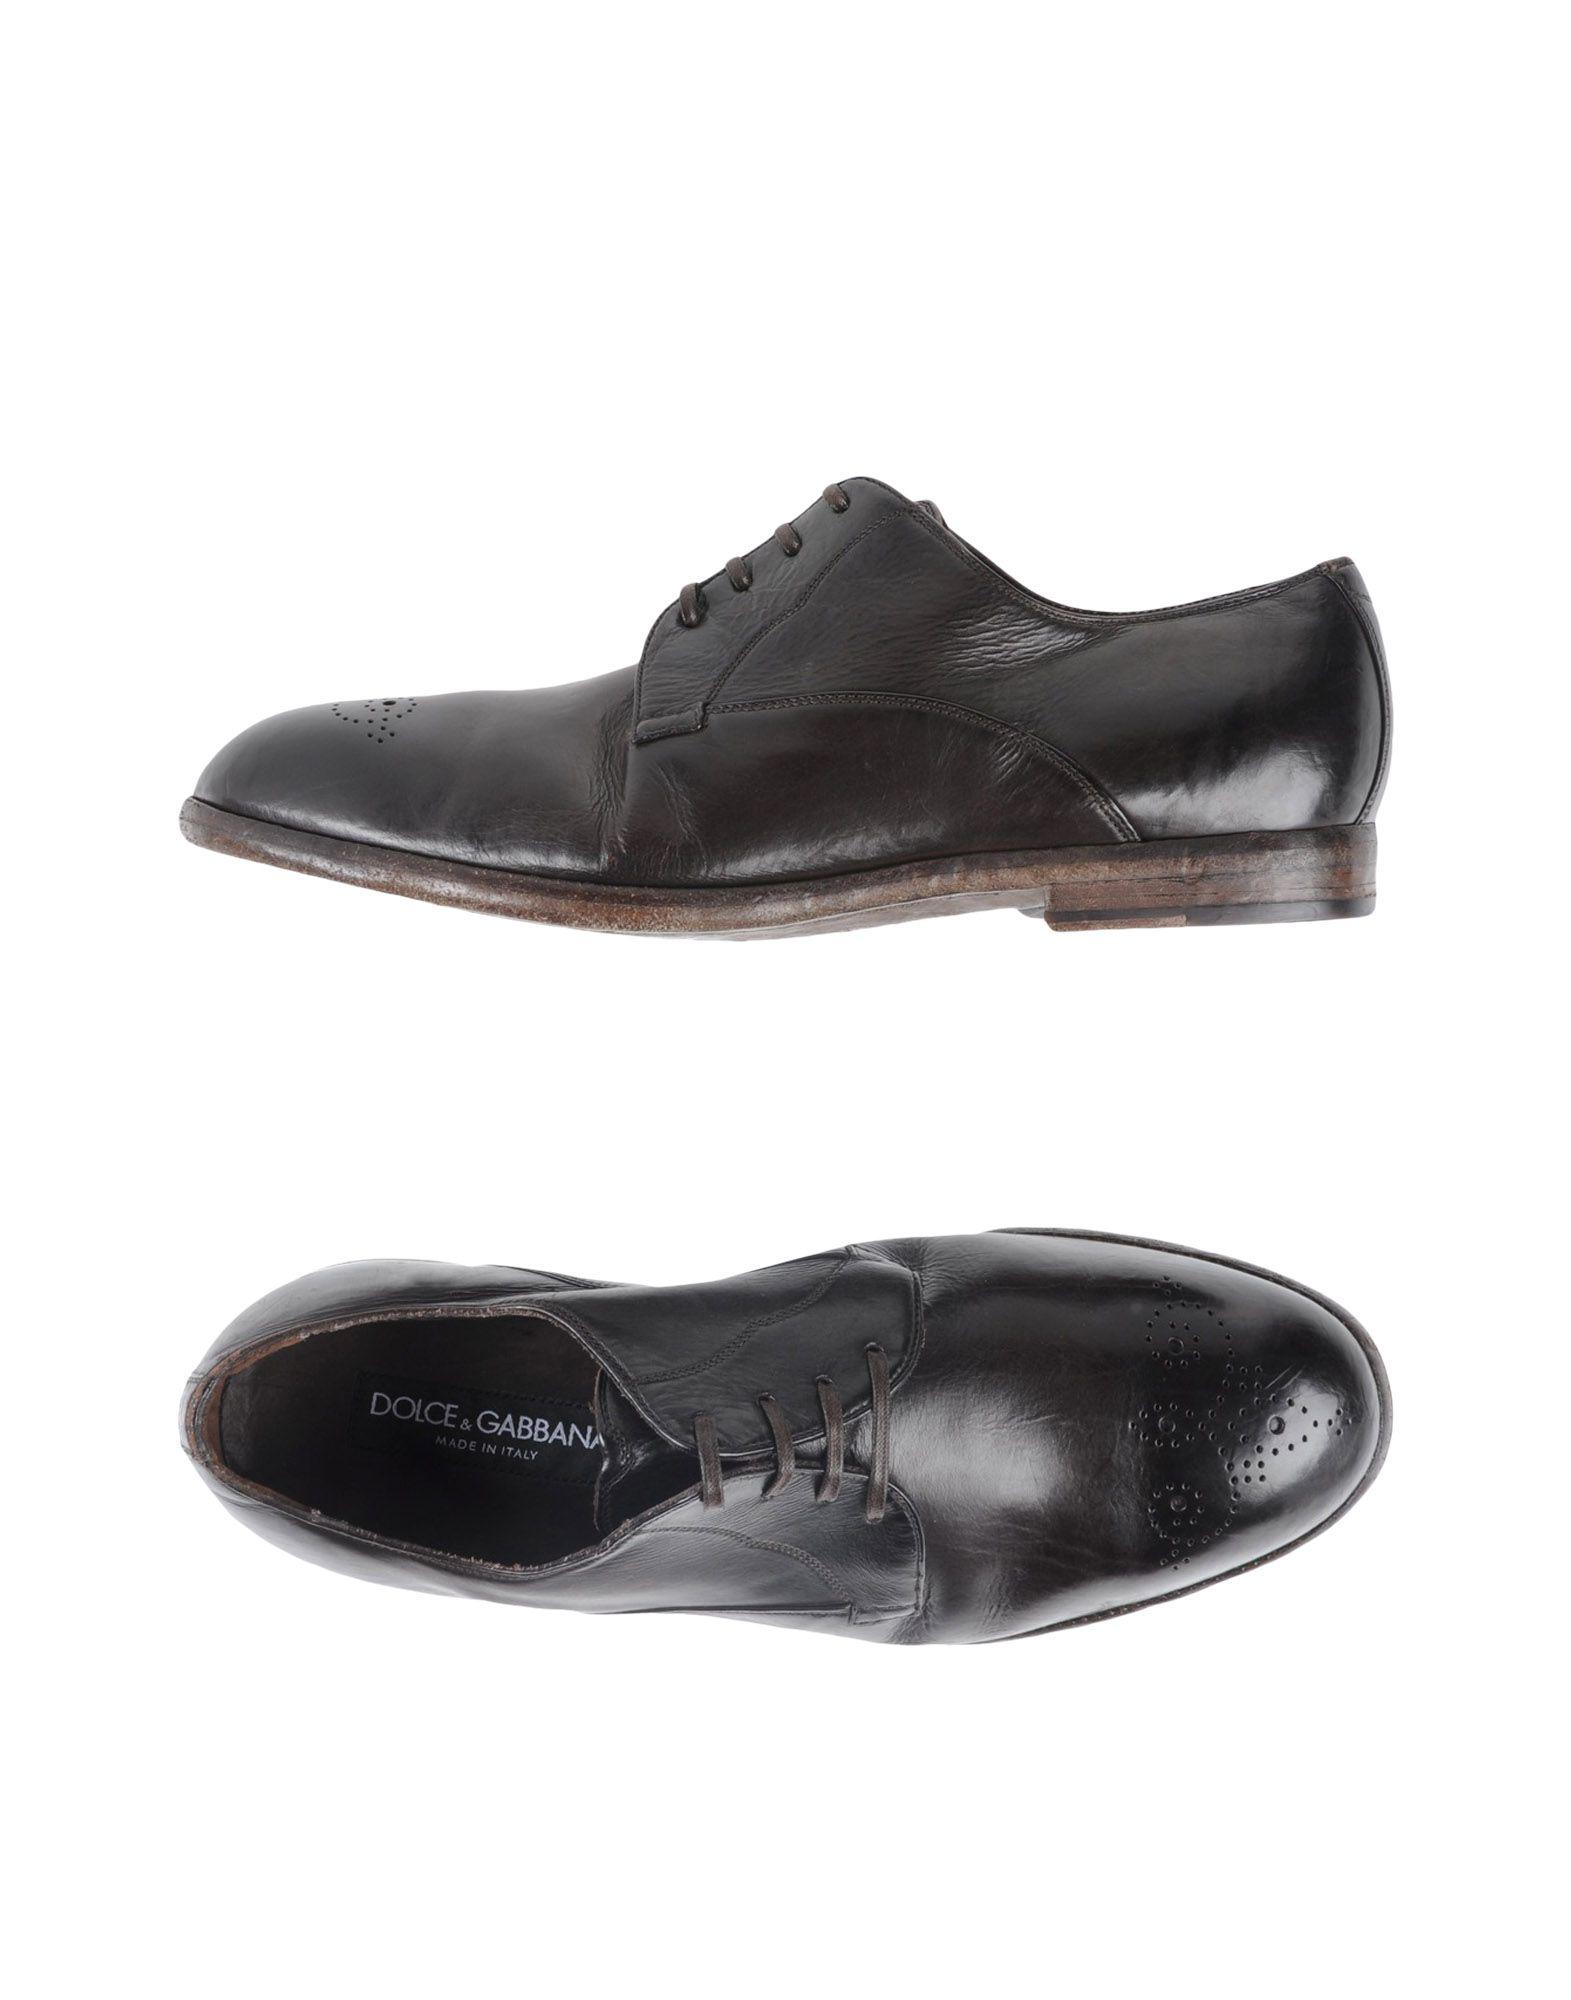 DOLCE & GABBANA Обувь на шнурках одежда из кожи dolce gabbana g9z03l fult6 dolce